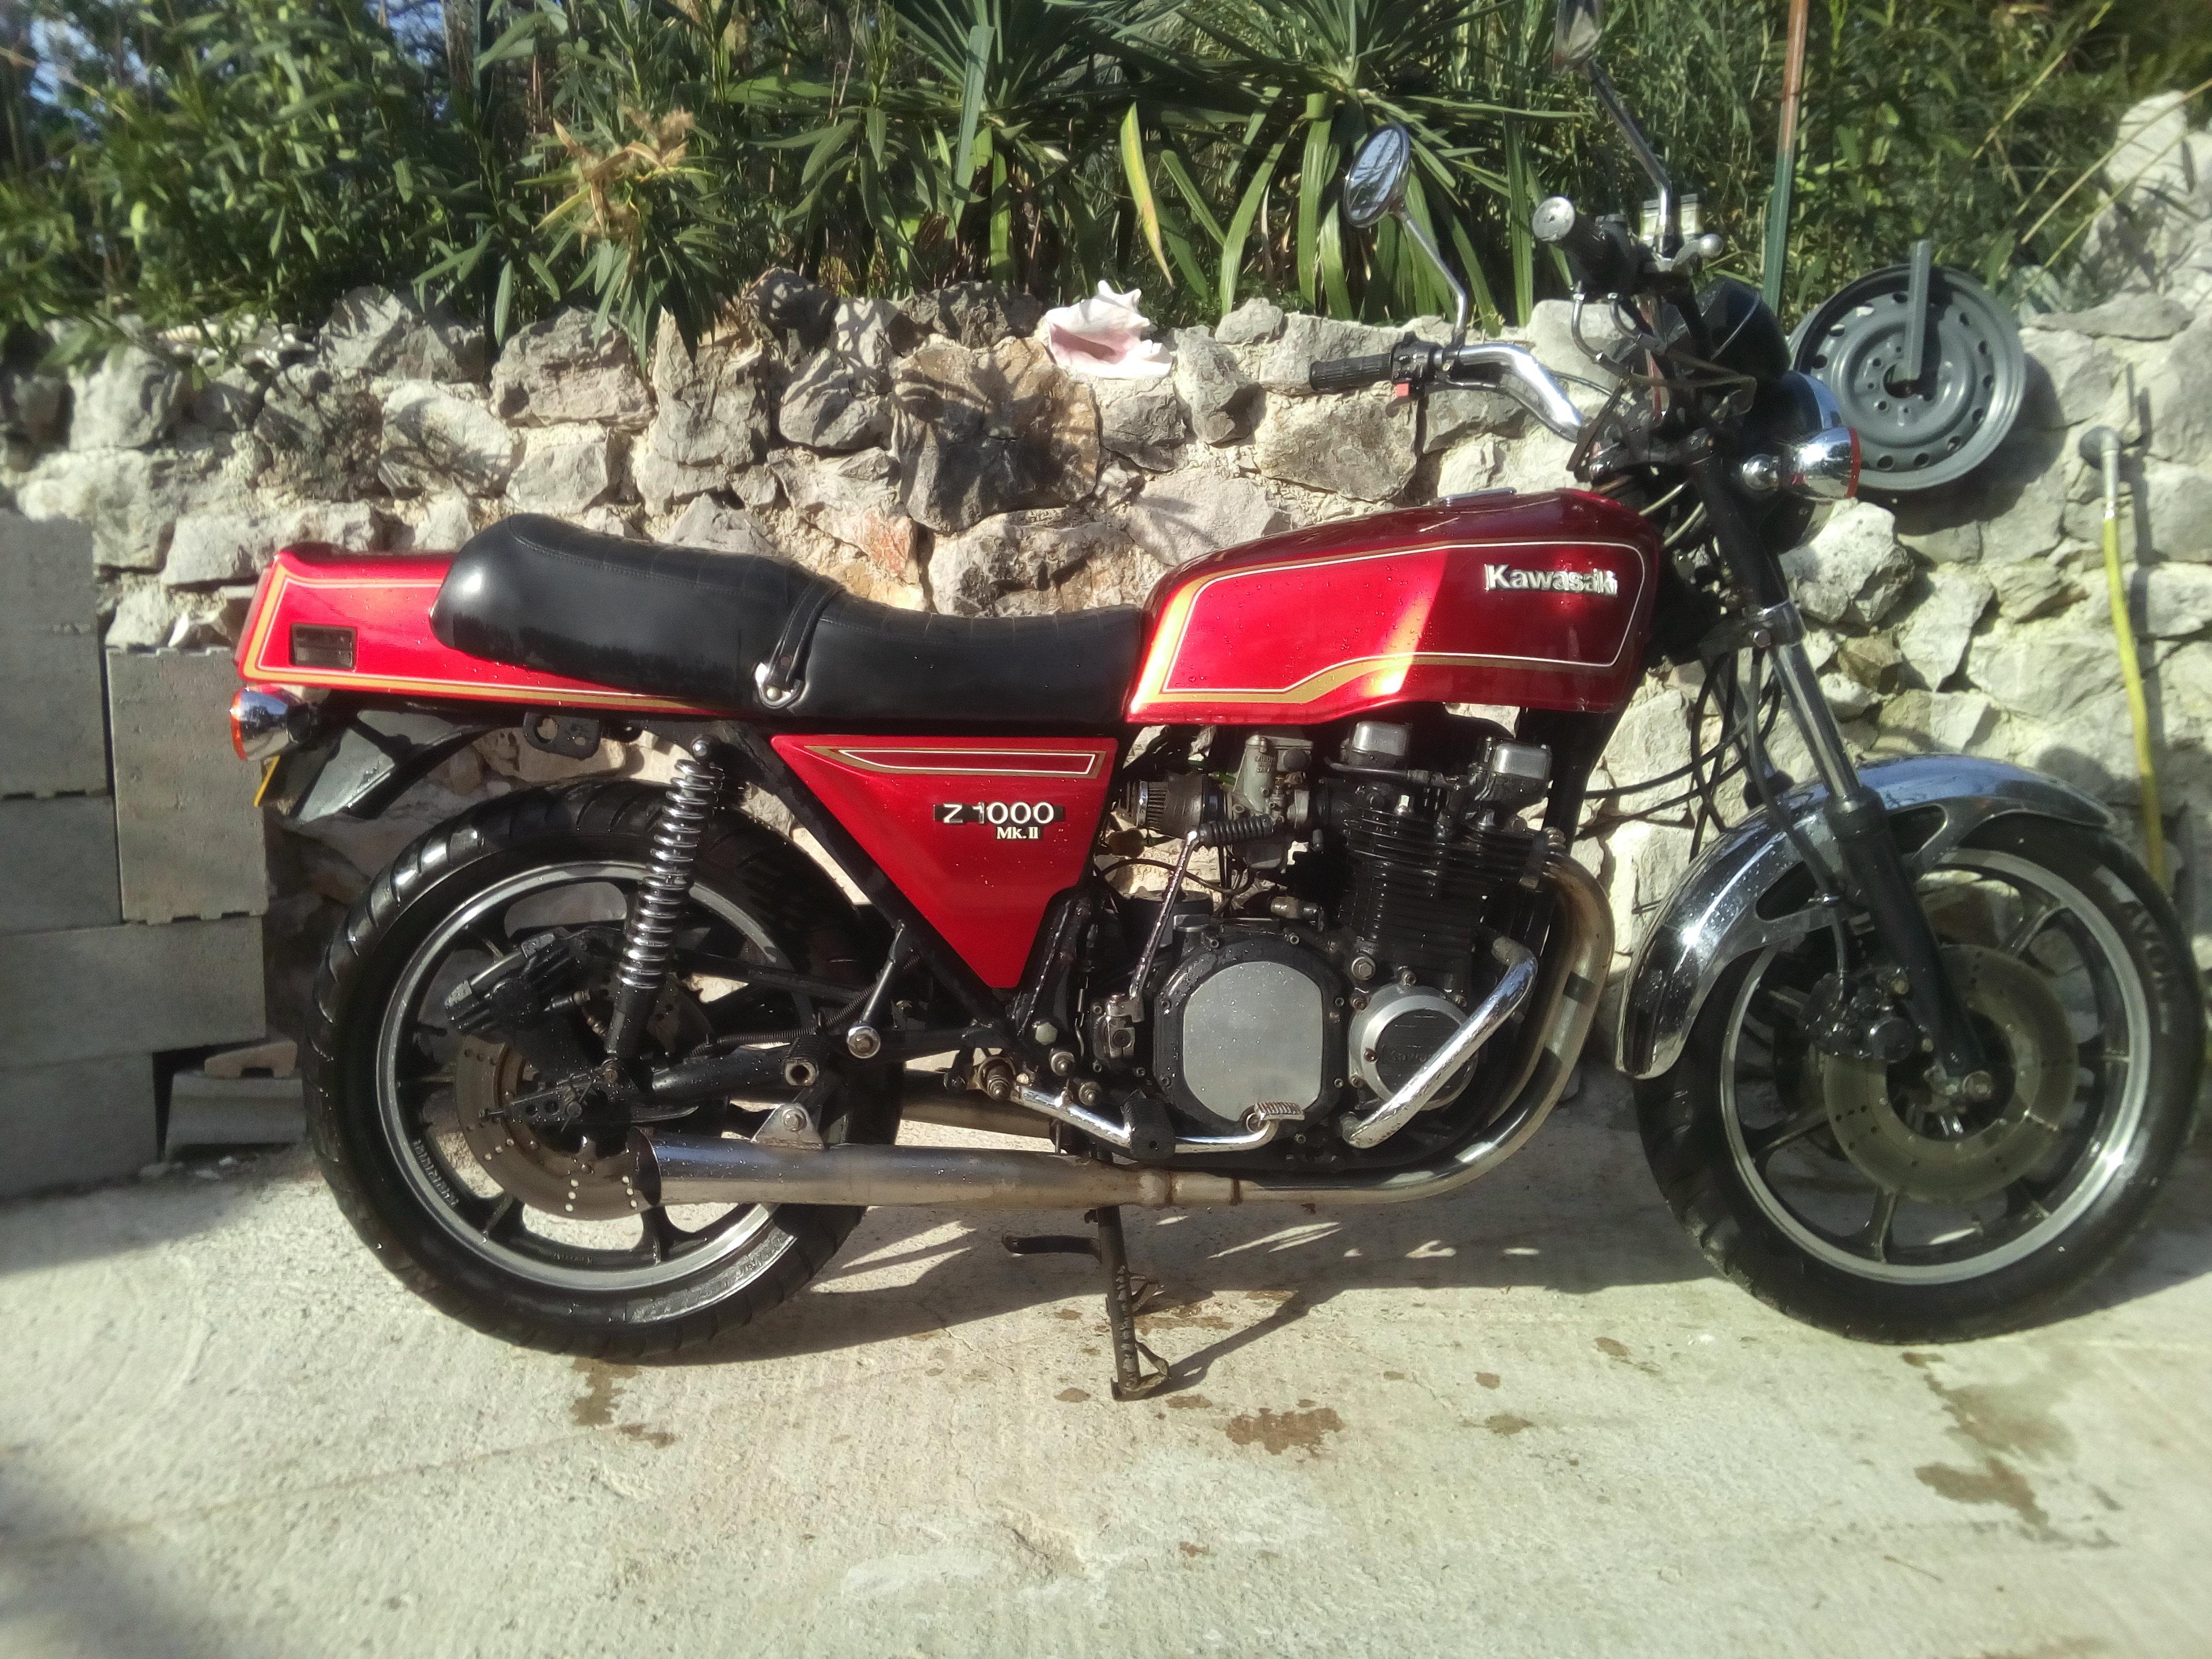 1979 Kawasaki Z1000 MK II For Sale (picture 2 of 4)